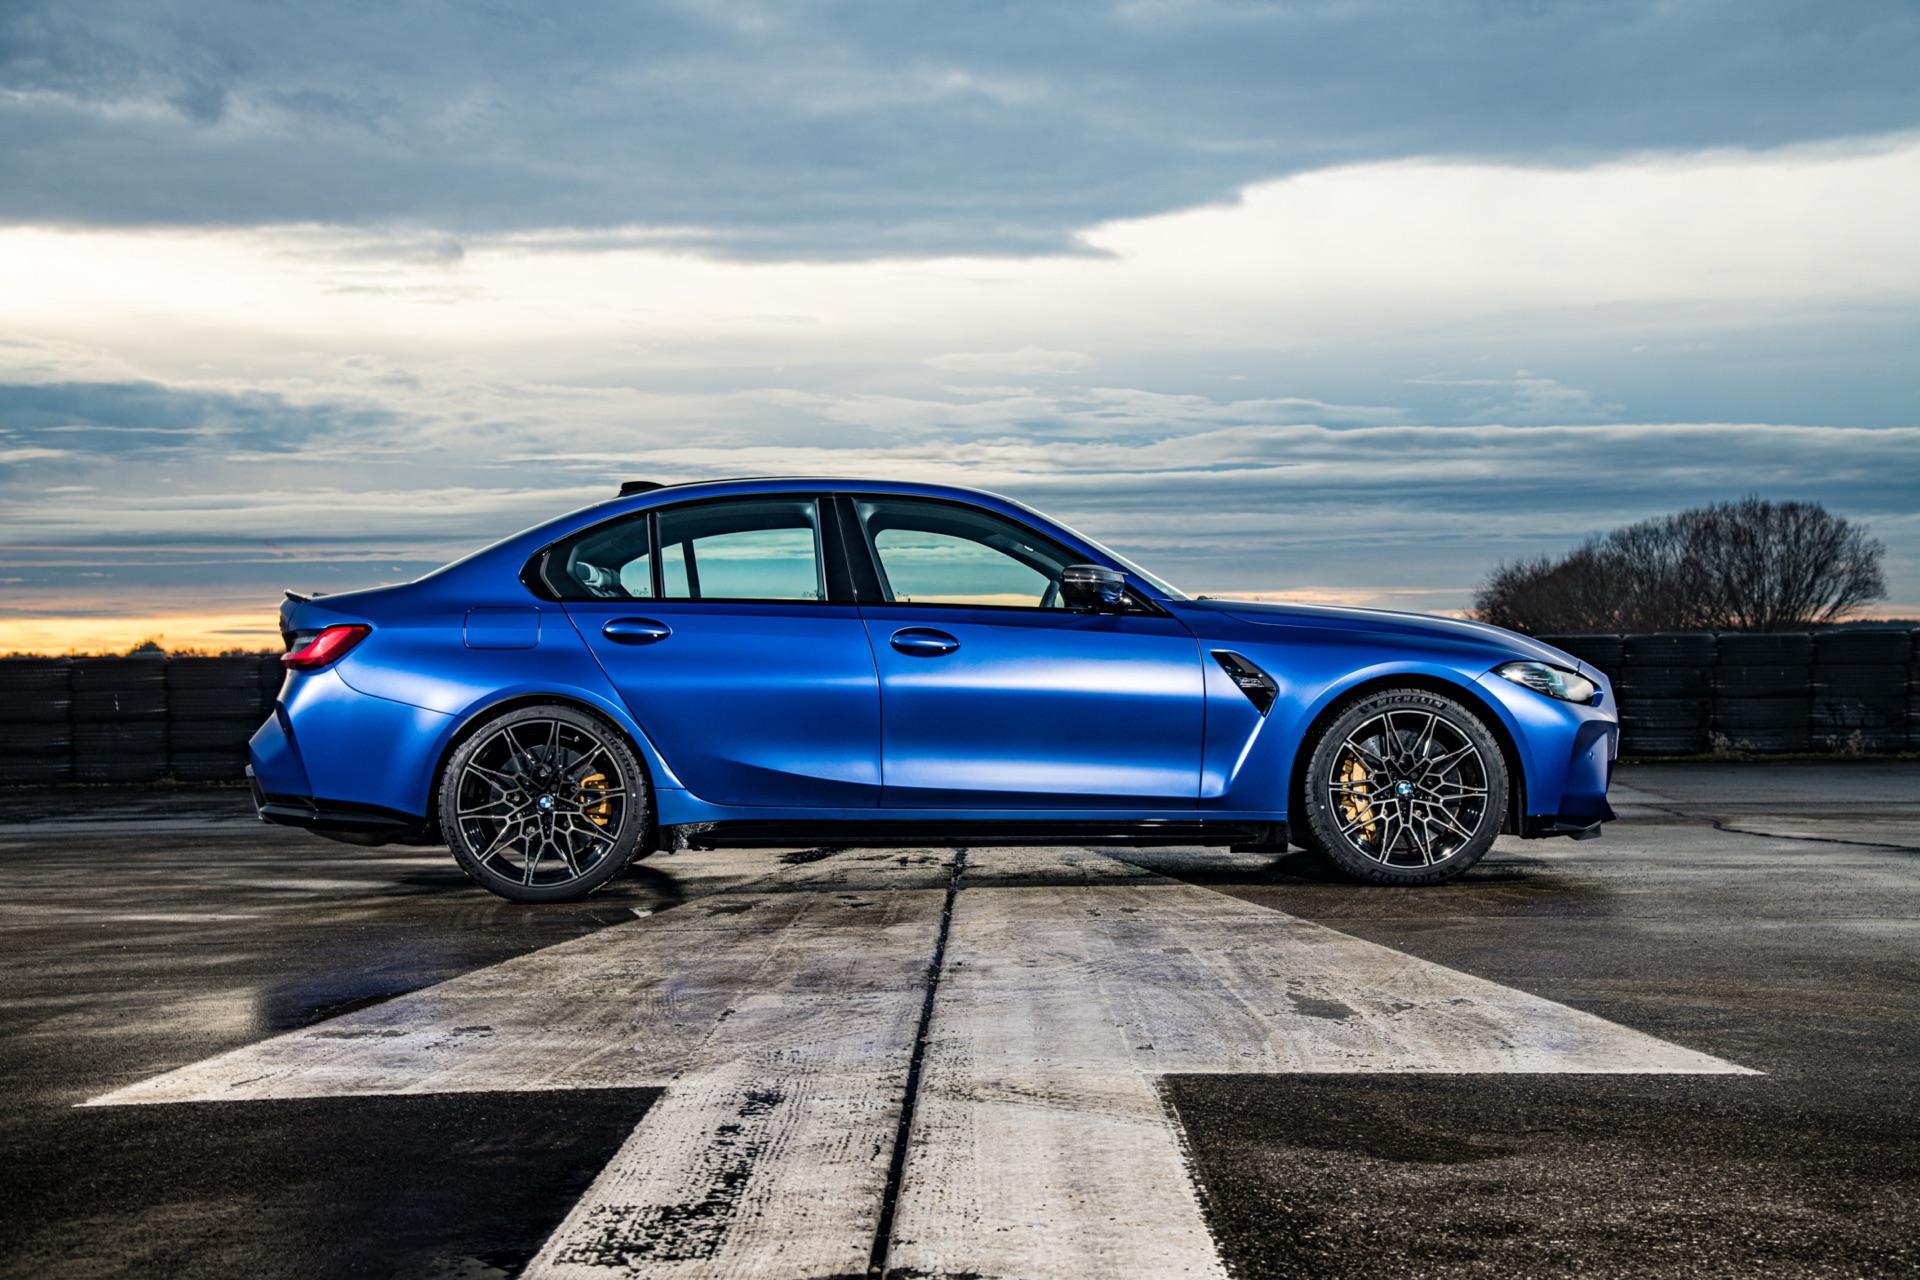 Portimao Blue BMW G80 M3 side view